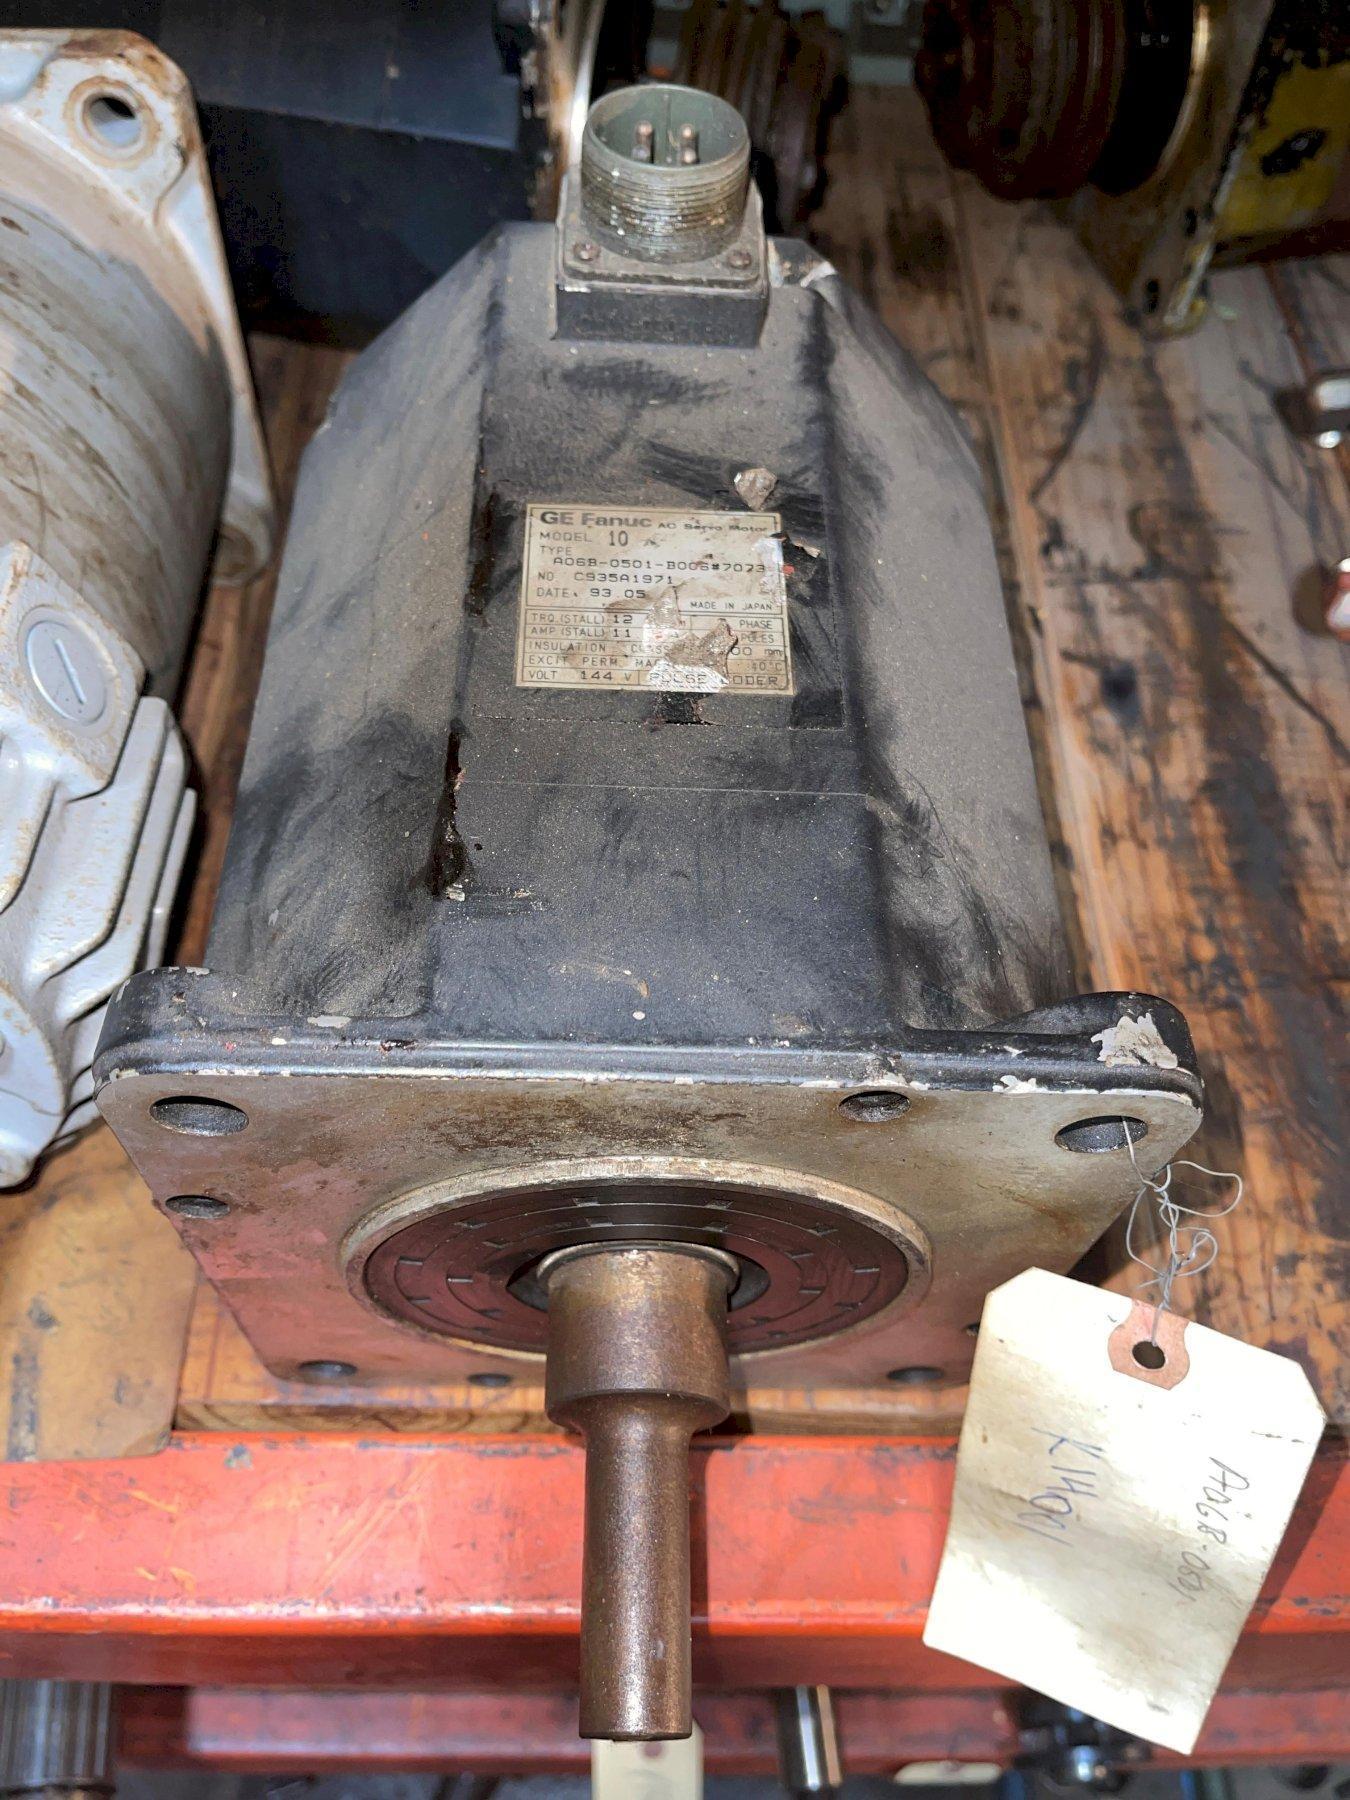 Fanuc Axis Servo Motor, MODEL 10, A06B-0501-B006#7073